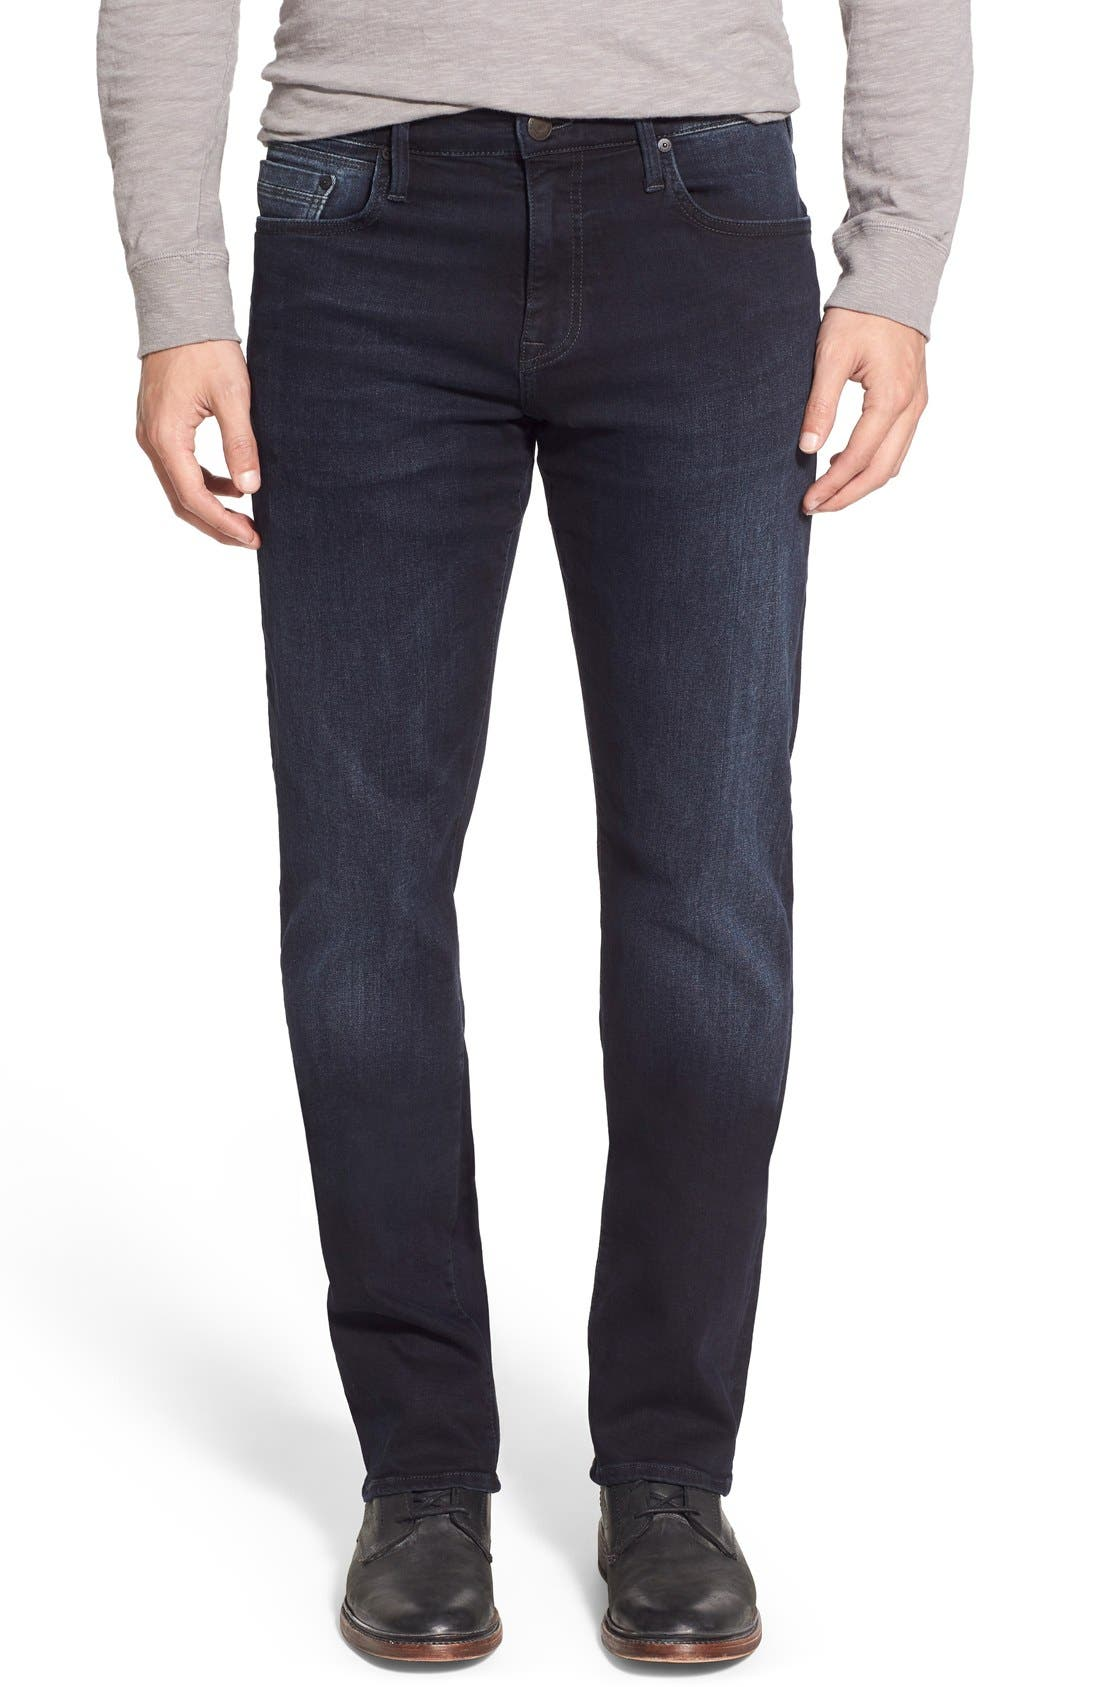 MAVI JEANS, Matt Relaxed Fit Jeans, Main thumbnail 1, color, INK WILLIAMSBURG